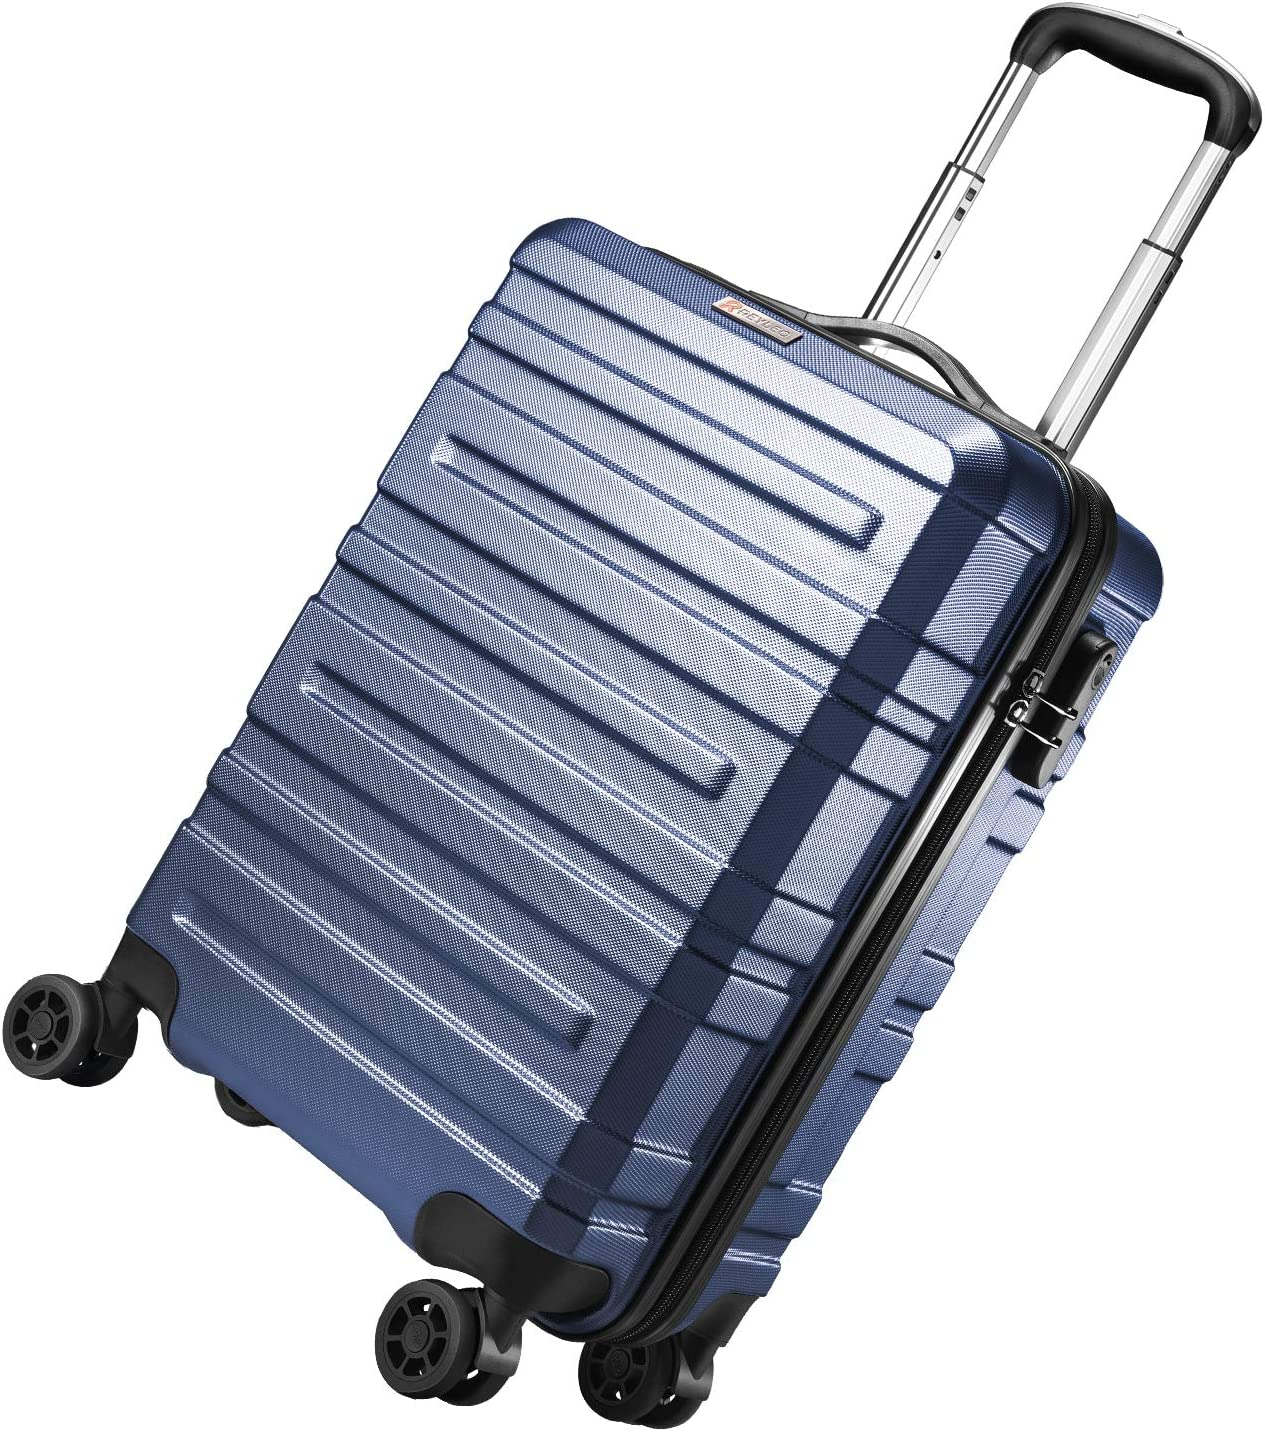 REYLEO Valise Trolley Cabine 55cm Bleue Valise Rigide 8 Roues pivotantes 35L Rigide Valise /à Code r/ésistante